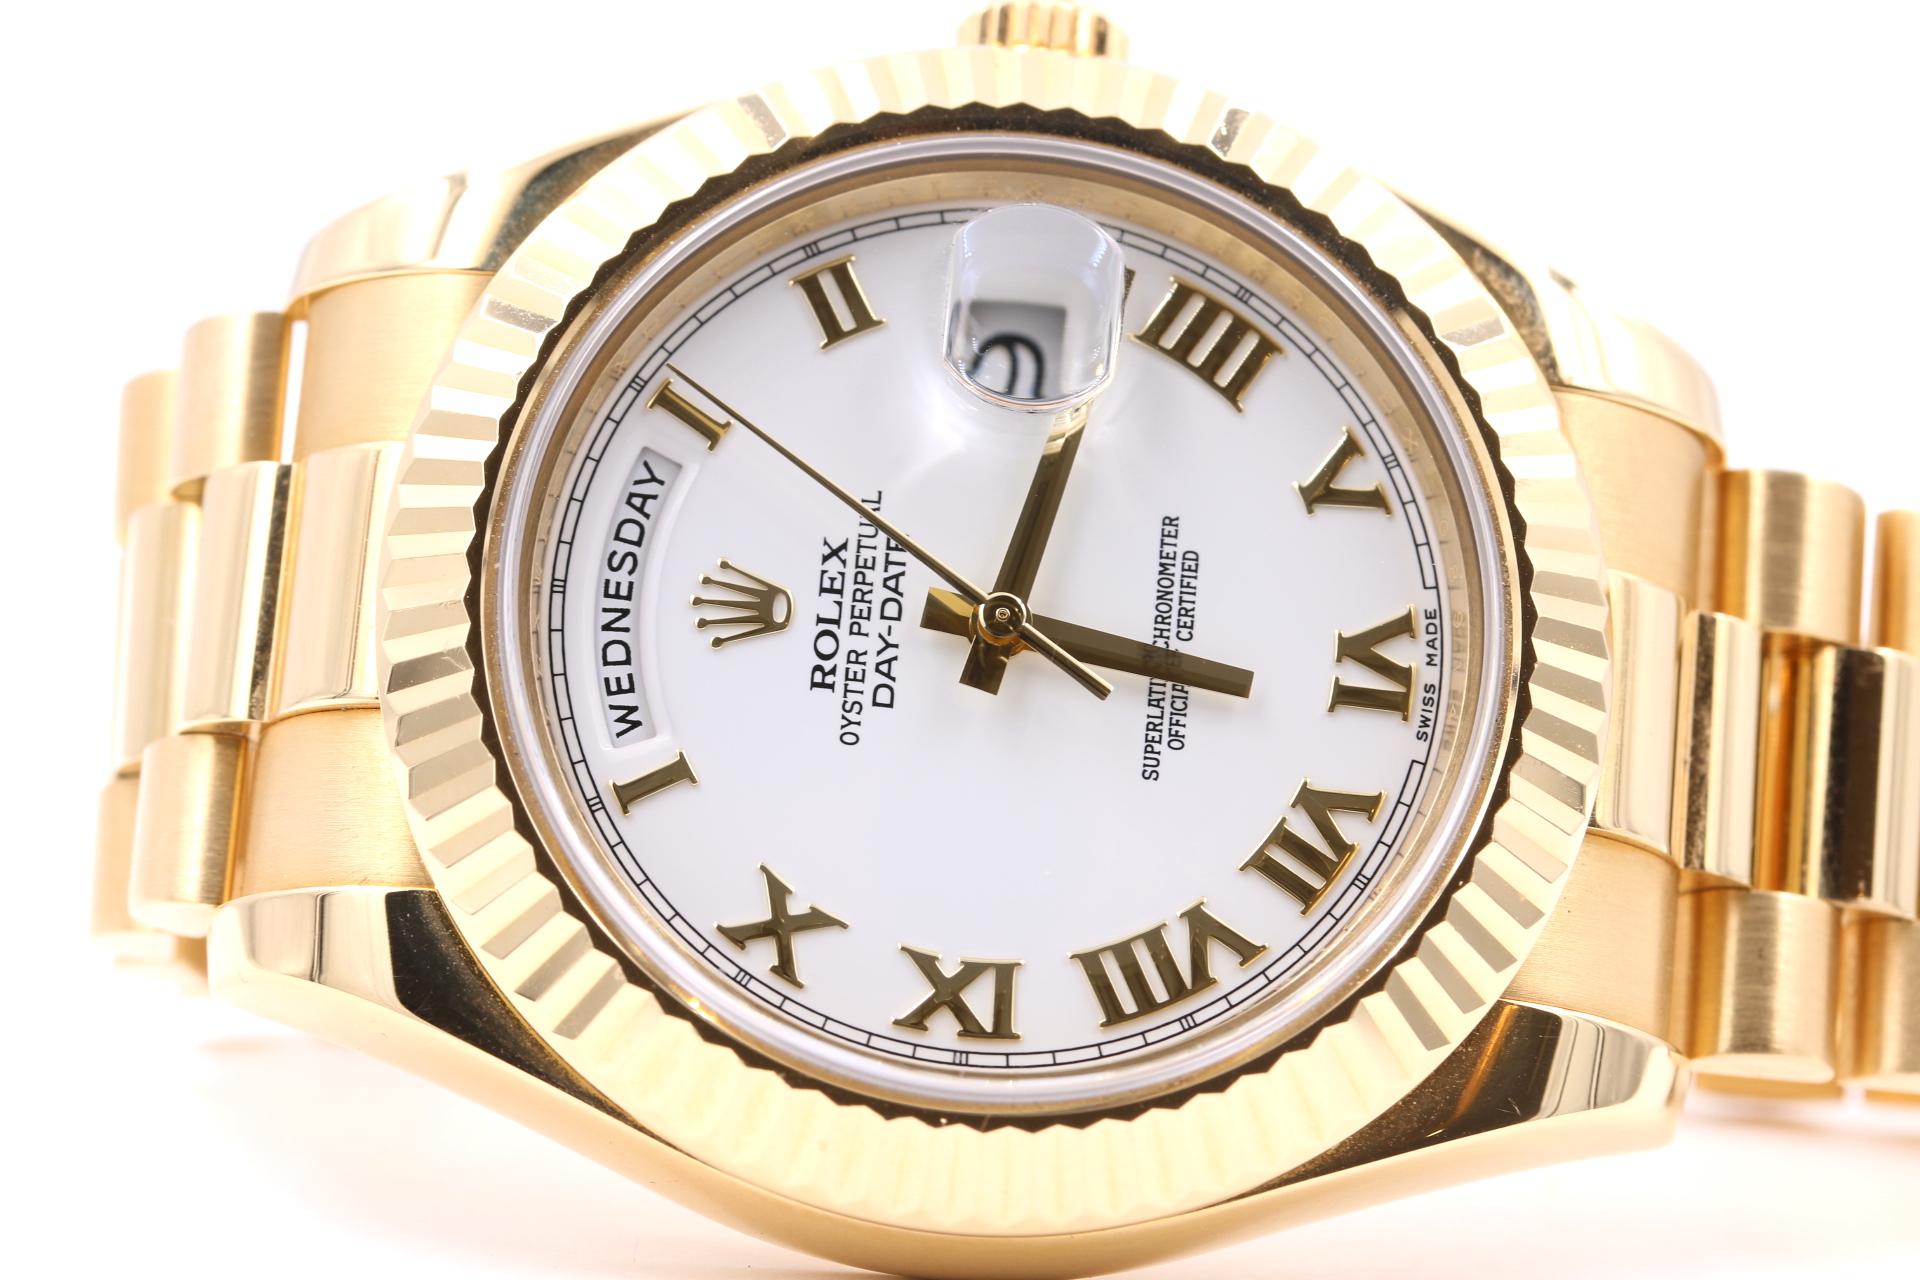 rolex watch broker orange county jeweler on side gold